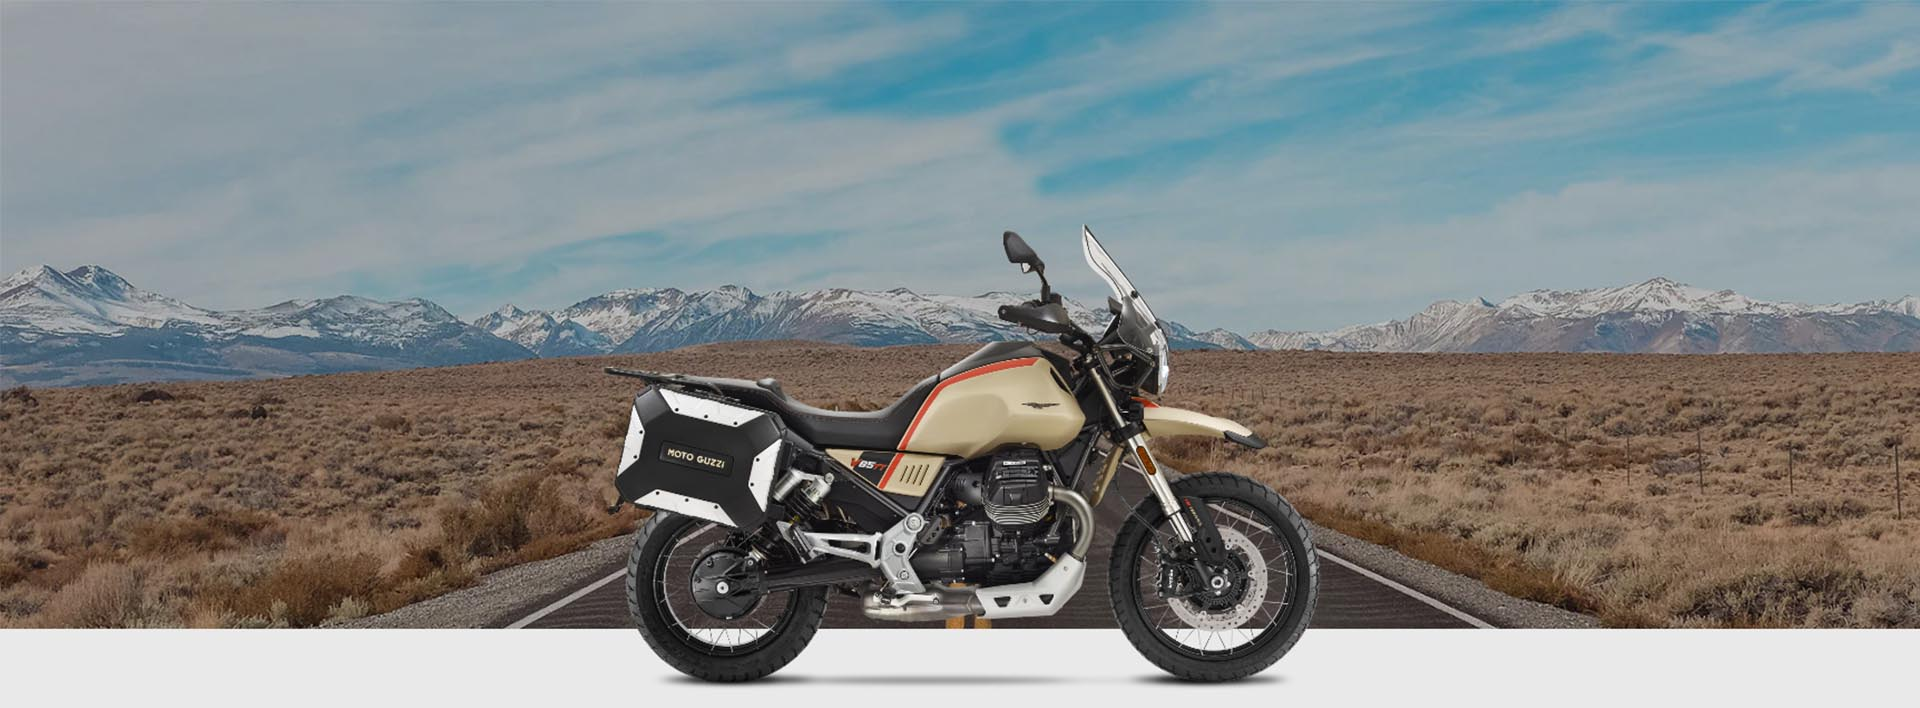 Moto Guzzi New Motorcycle Range